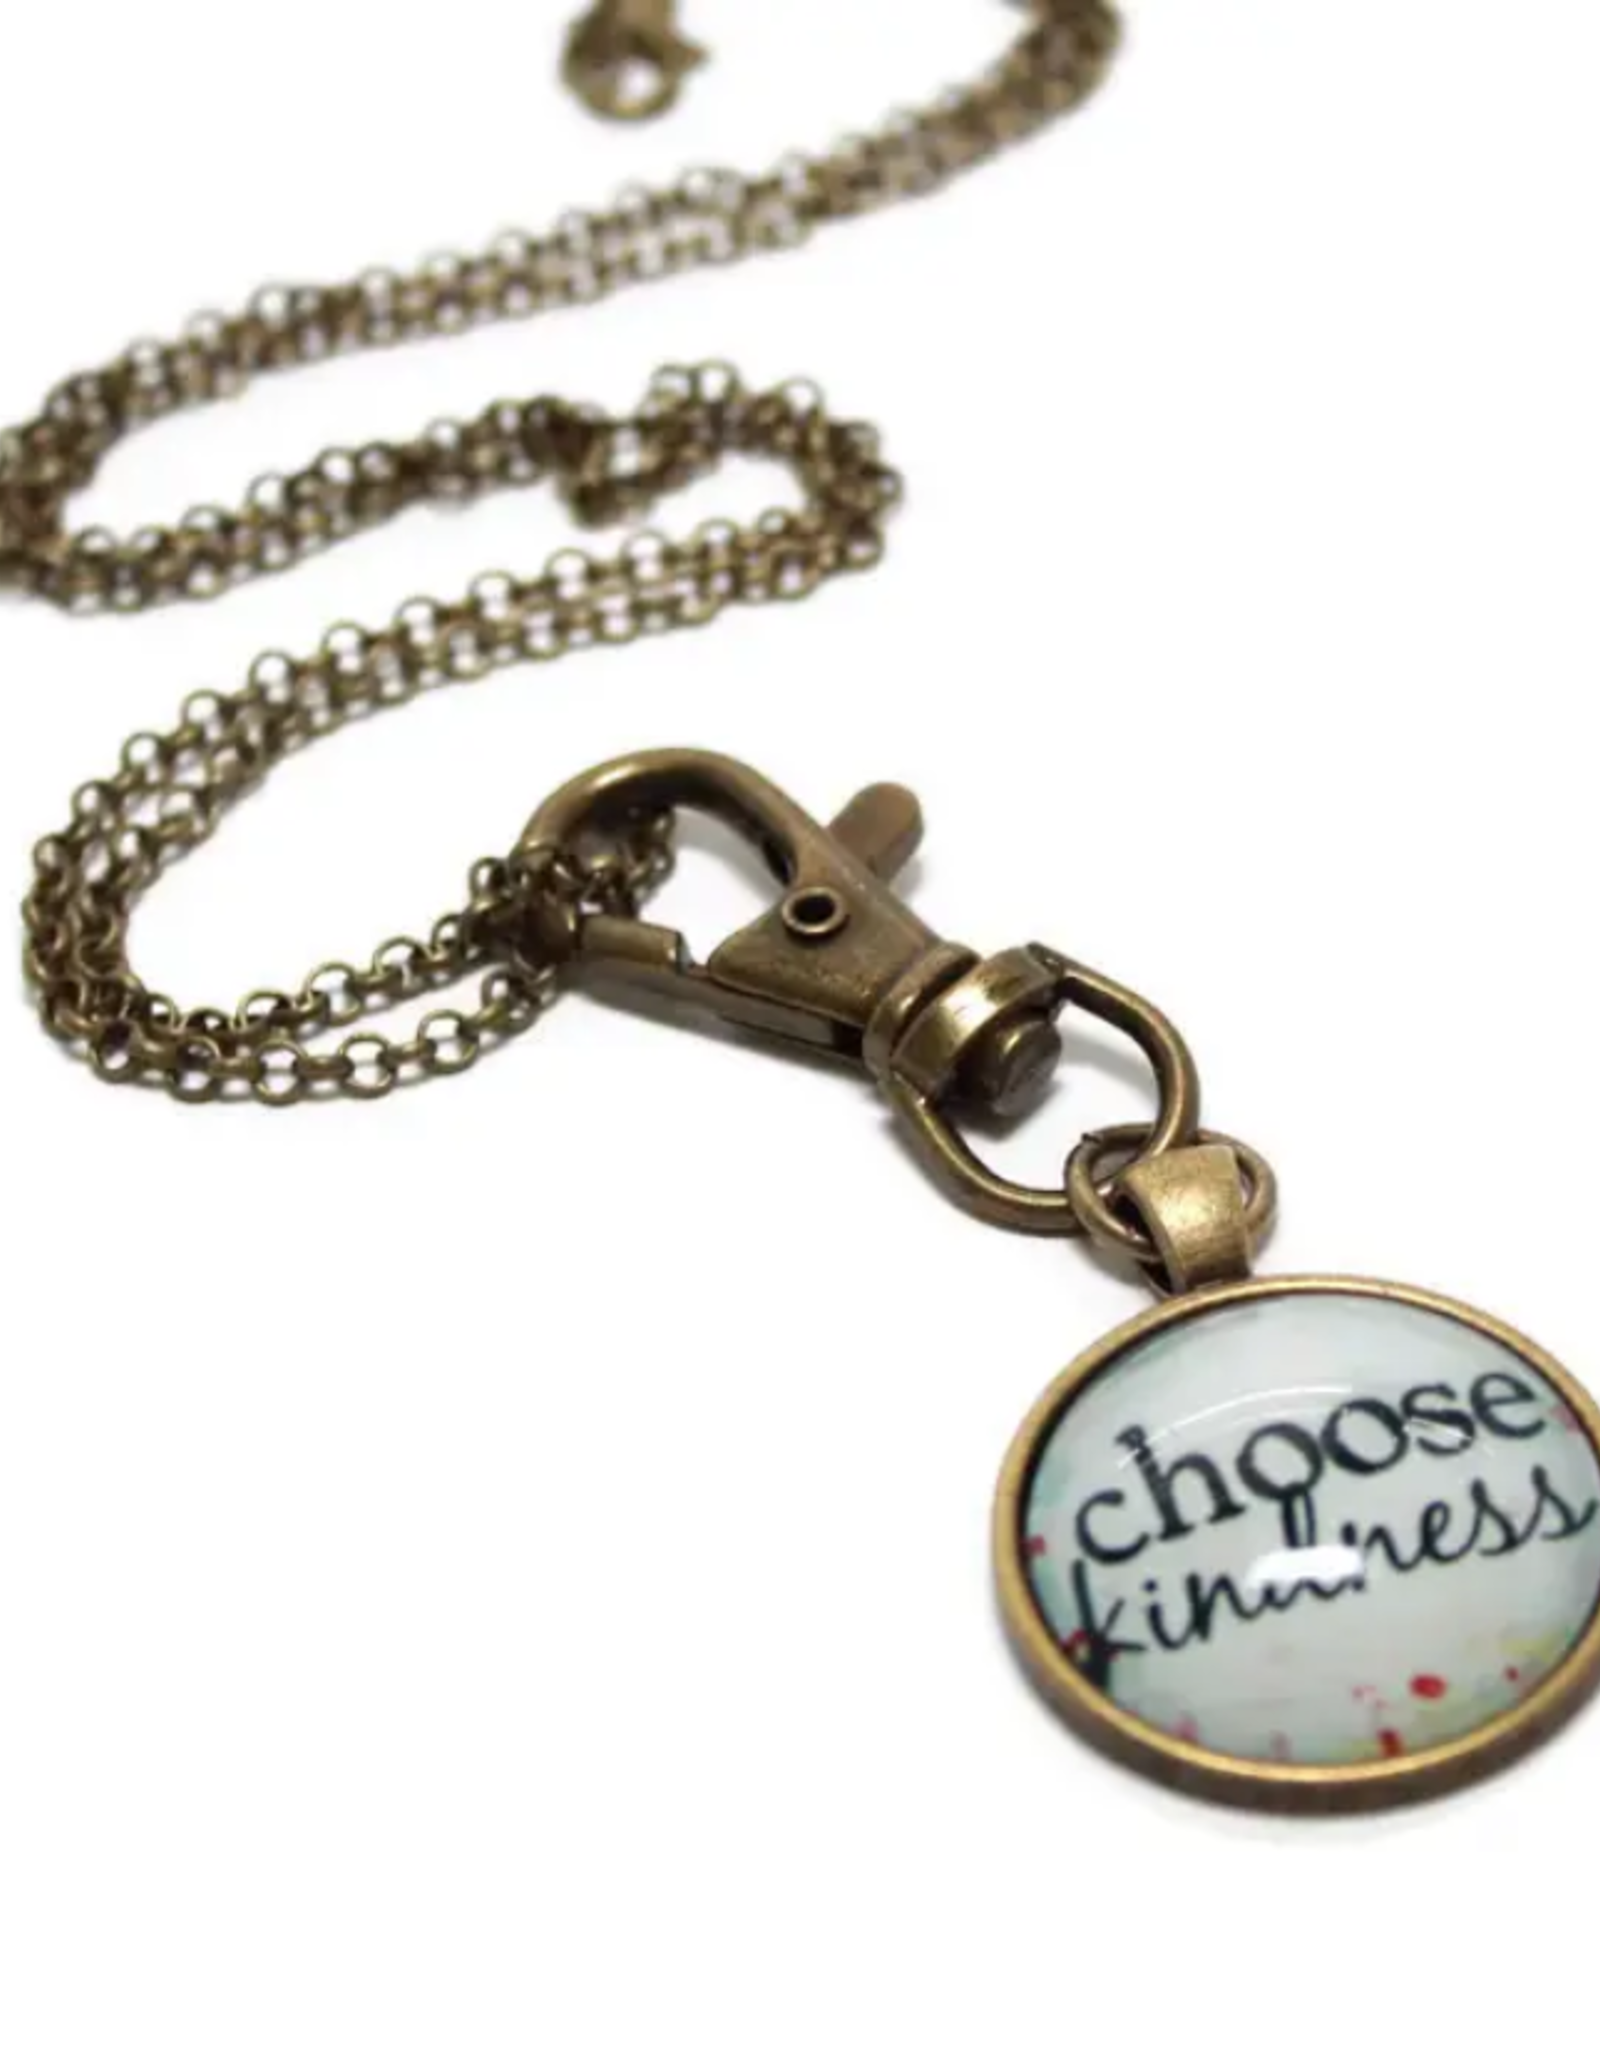 Gleeful Peacock Choose Kindness necklace